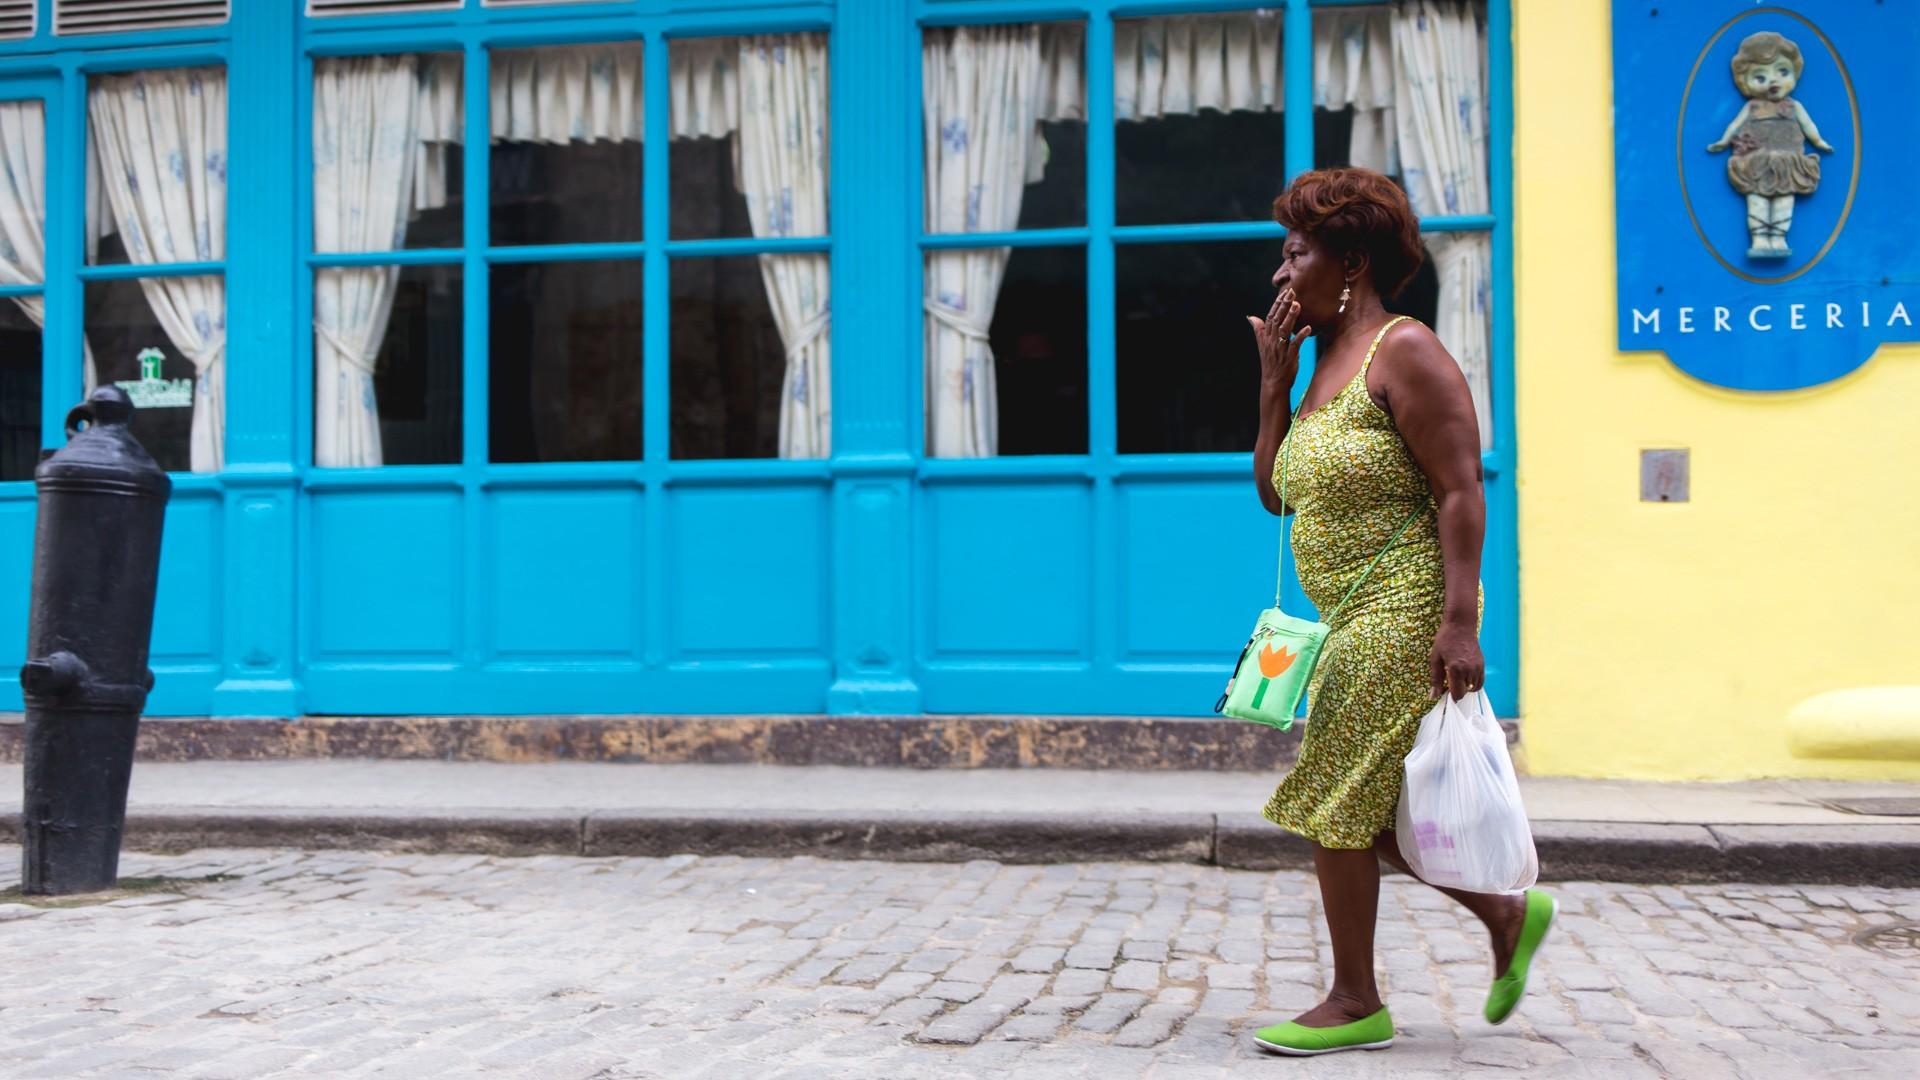 Damien-Dohmen-Photographe-Cuba-3